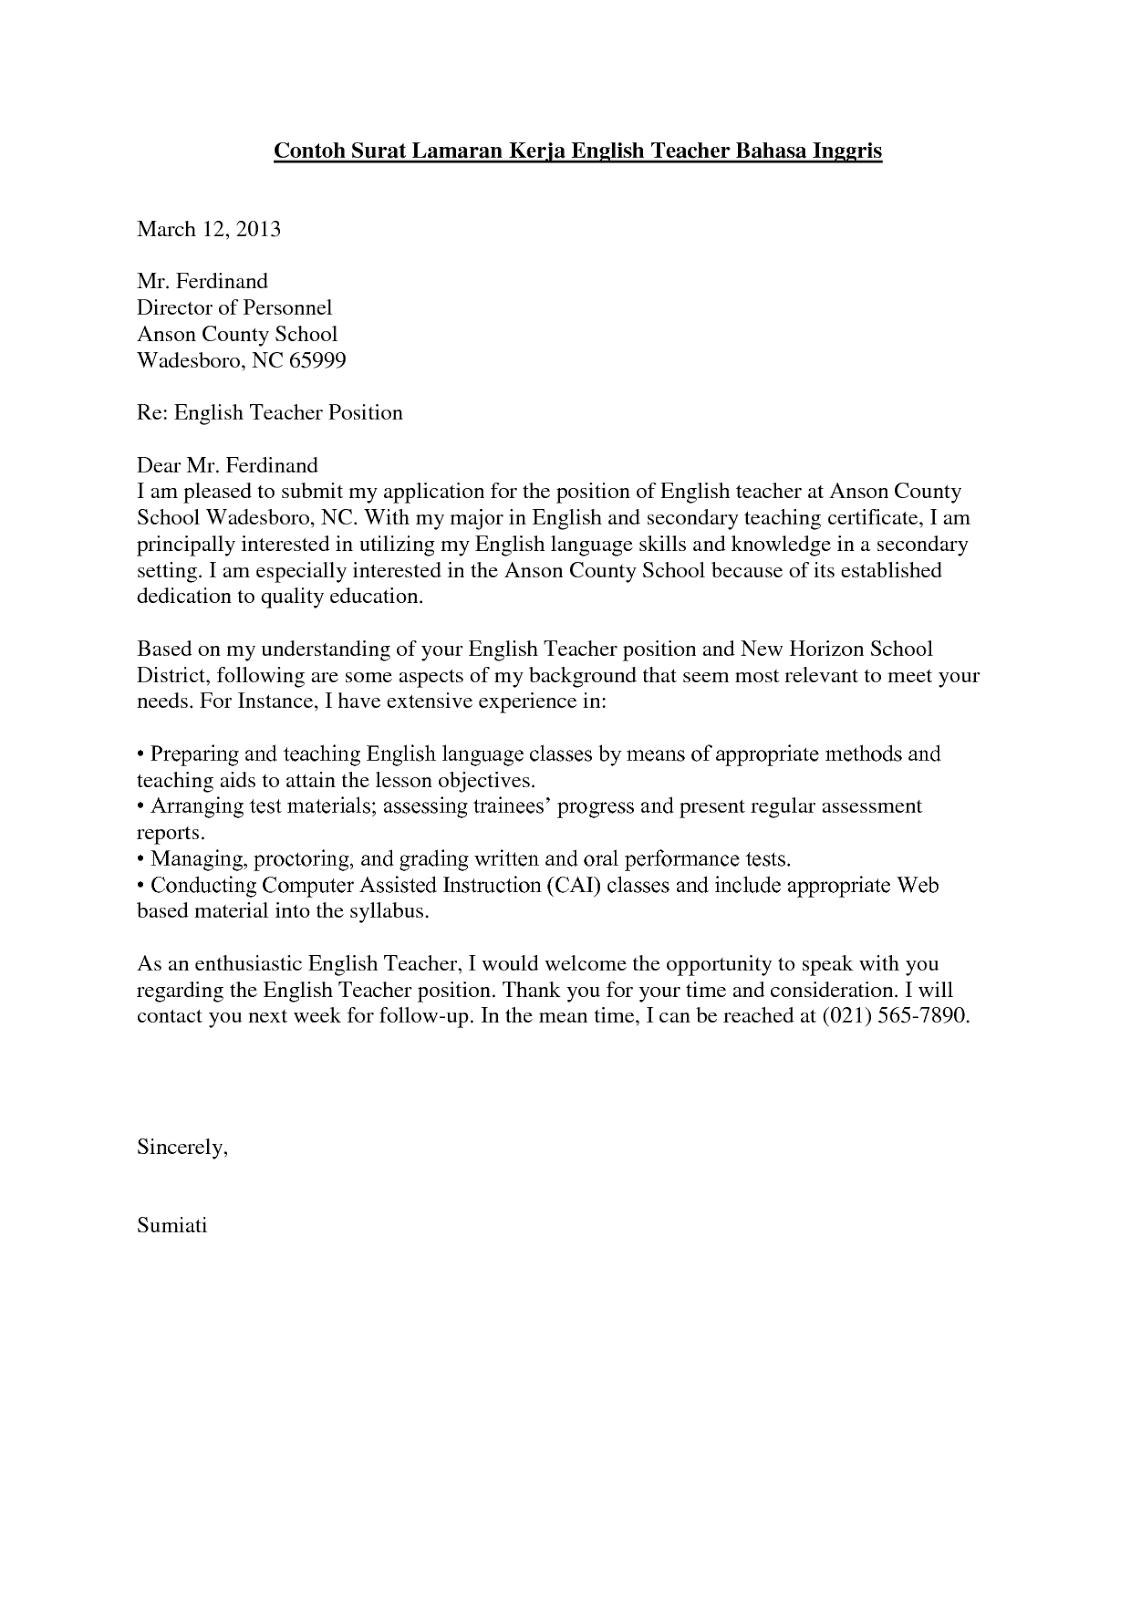 Surat Lamaran Kerja Guru Bahasa Inggris Bahasa inggris, Guru